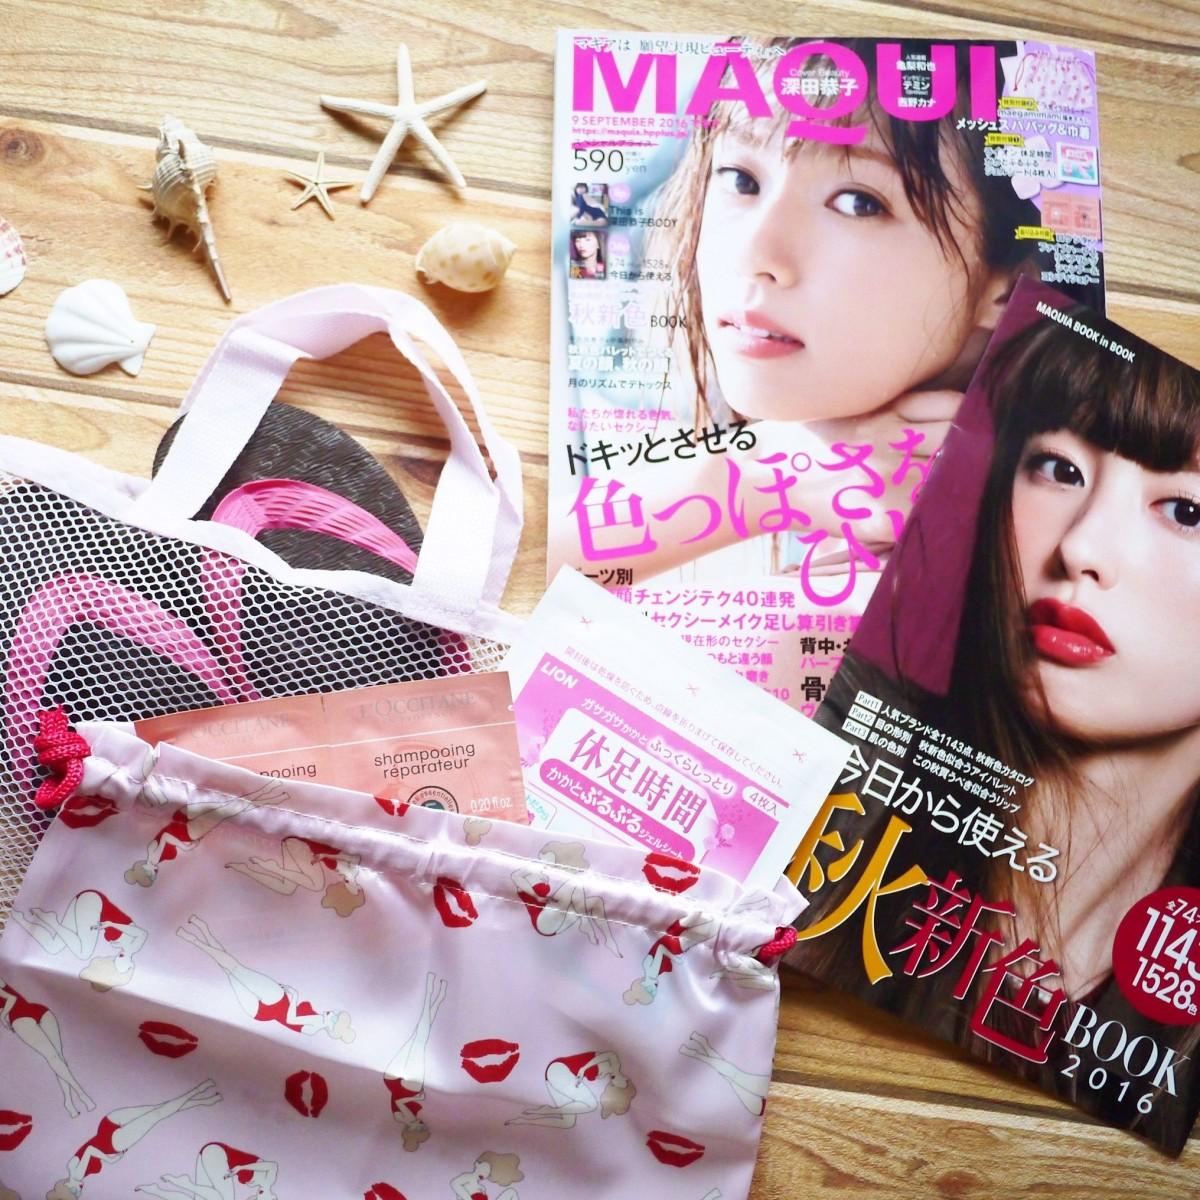 MAQUIA9月号は今知りたい「夏美容」と早く知っておきたい「秋美容」の情報満載!【付録も充実】